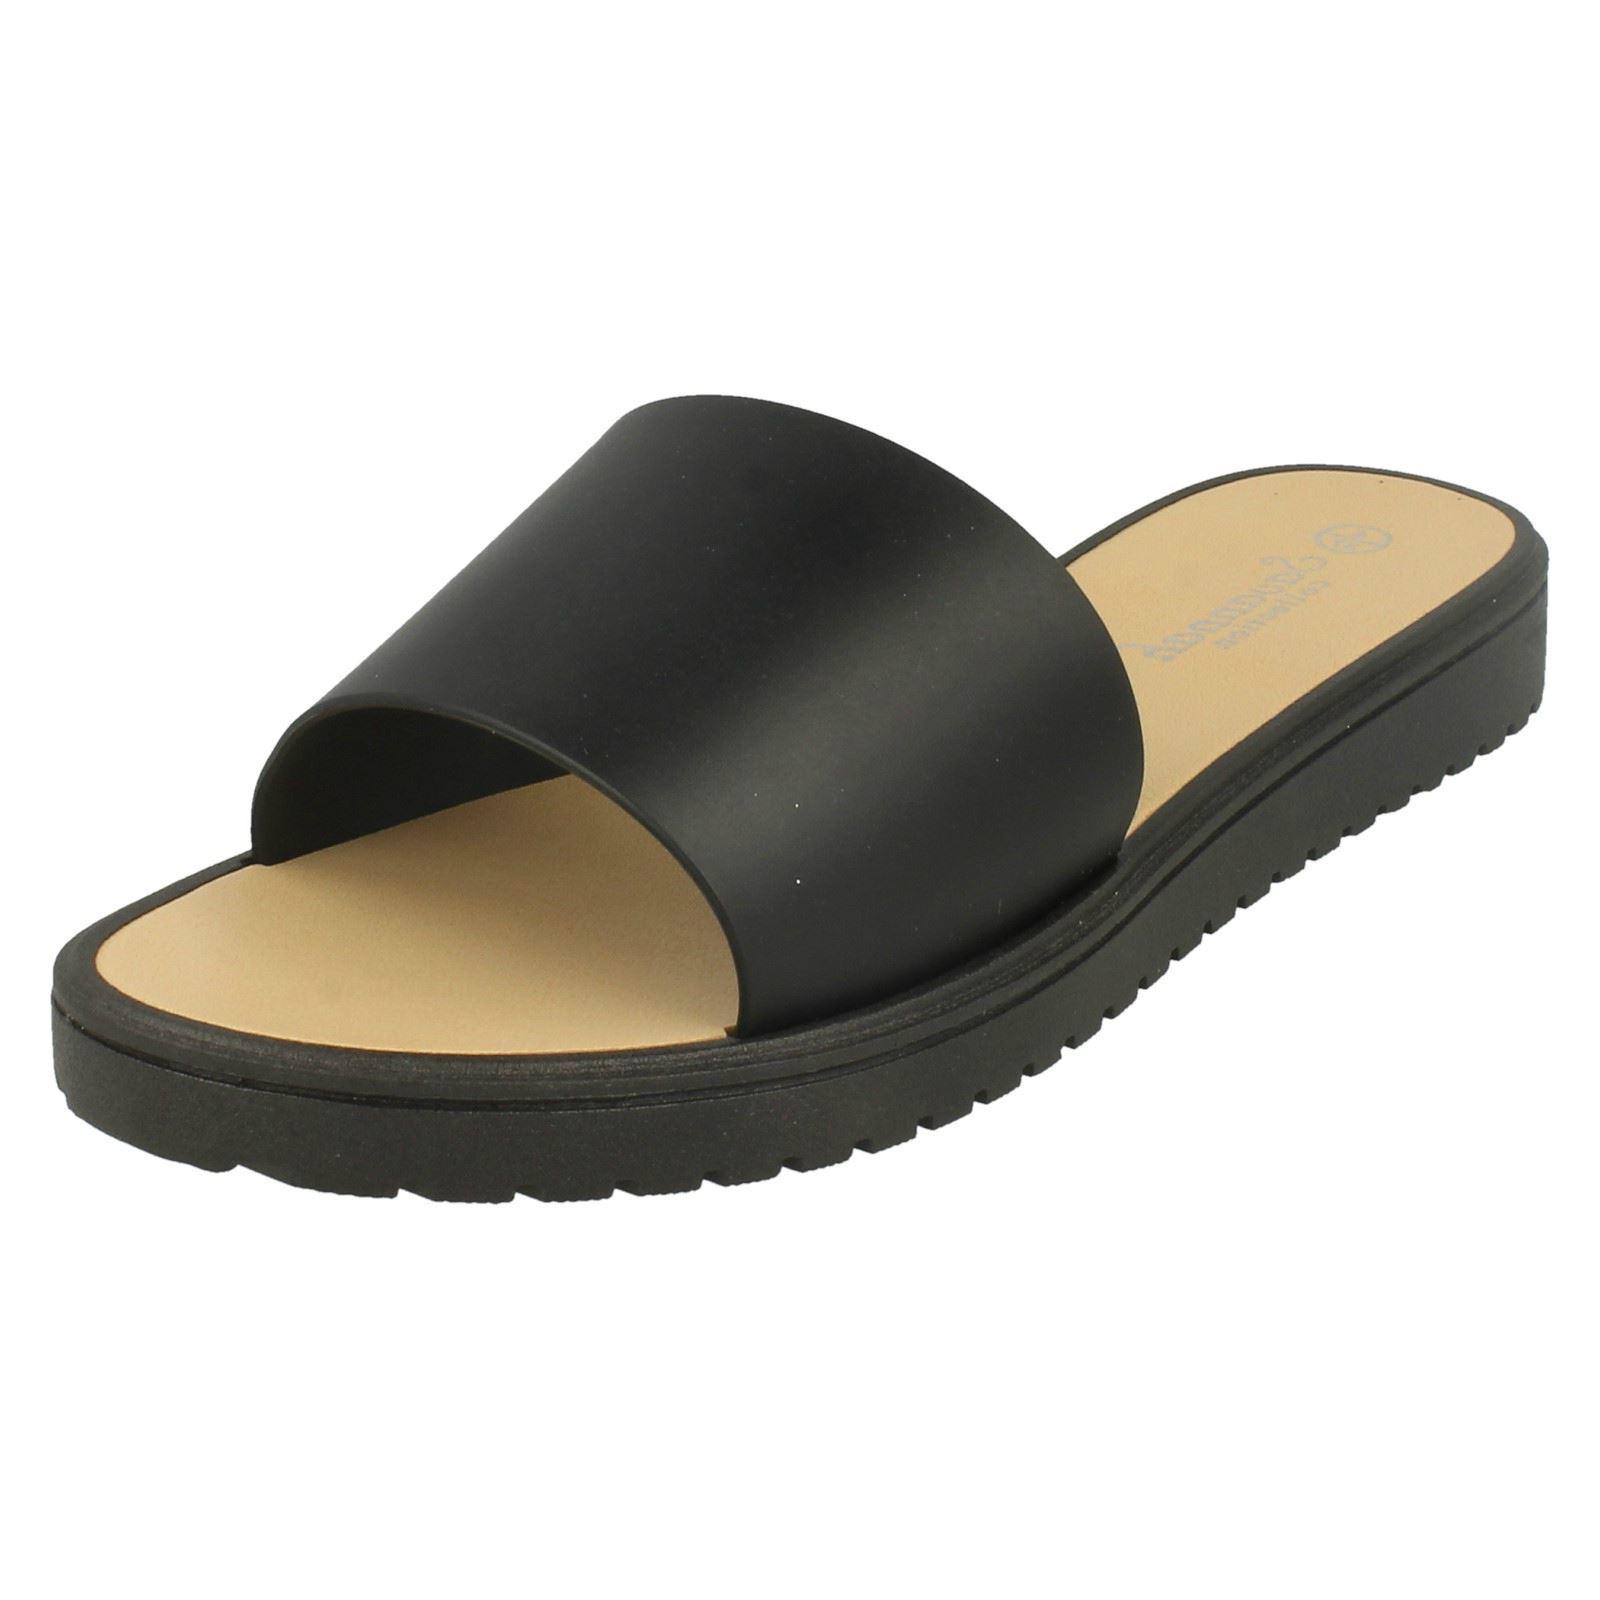 Ladies F0807 synthetic mule sandals by Savannah Sale Retail price £5.99